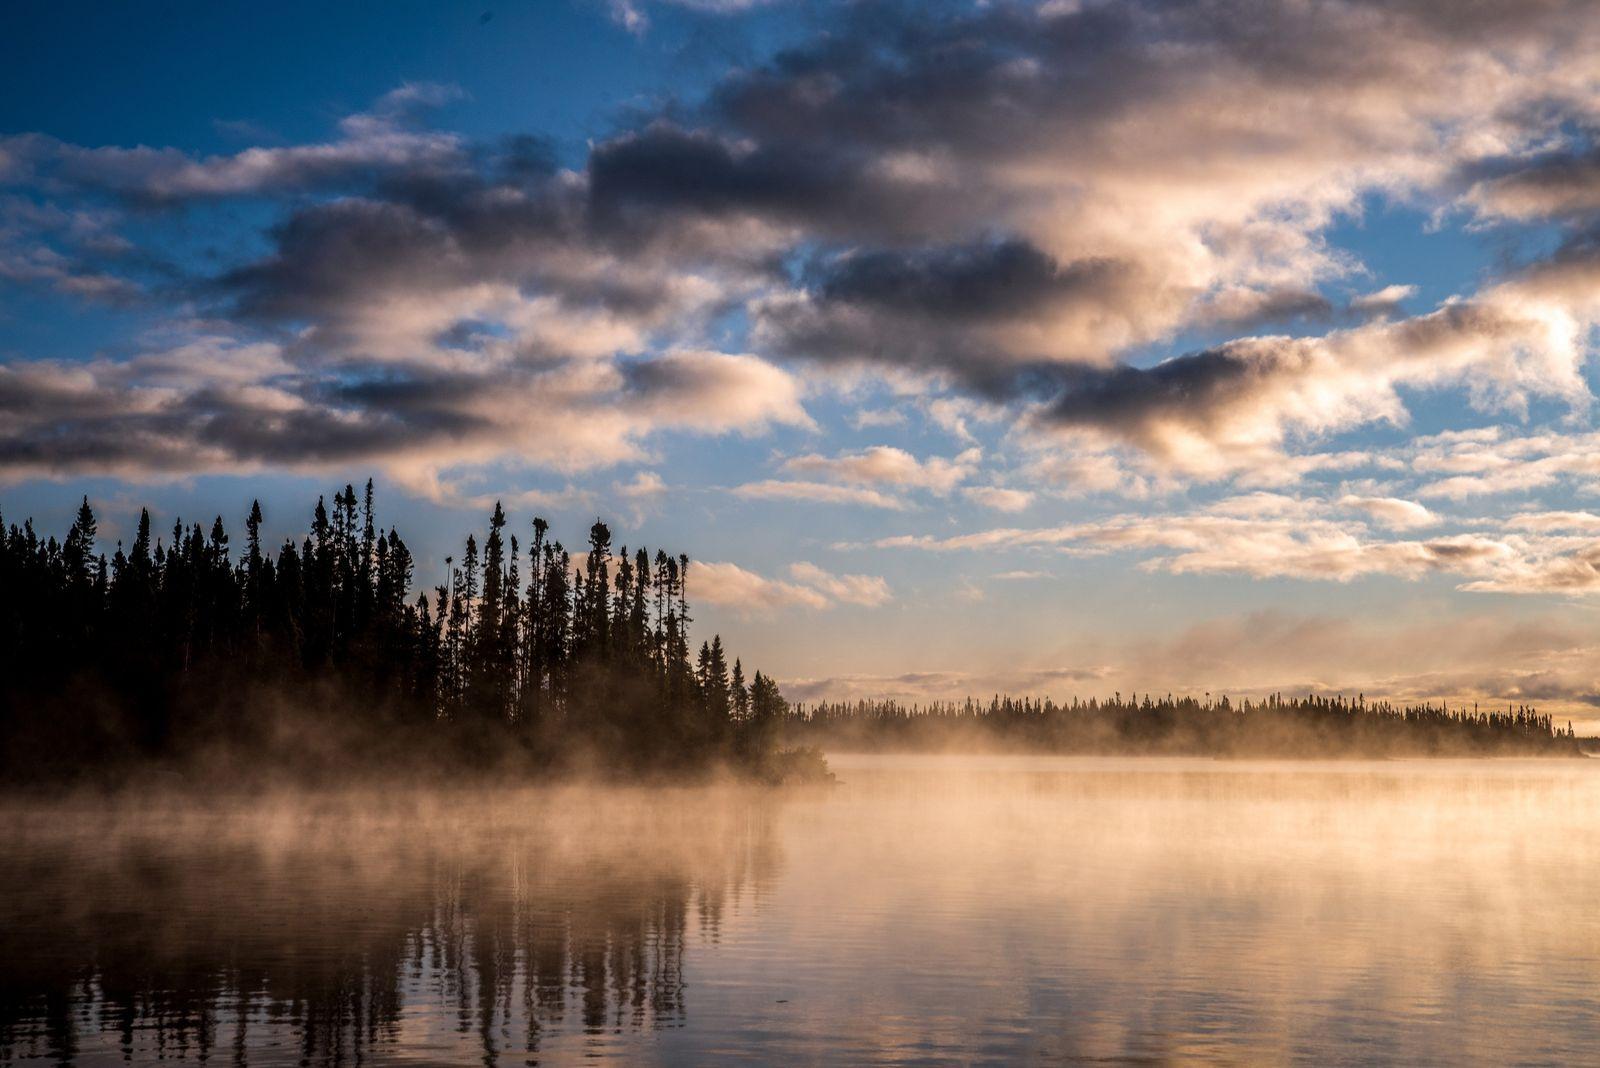 Ein nebeliger Morgen am Opemisca, Oujé-Bougoumou, Québec.